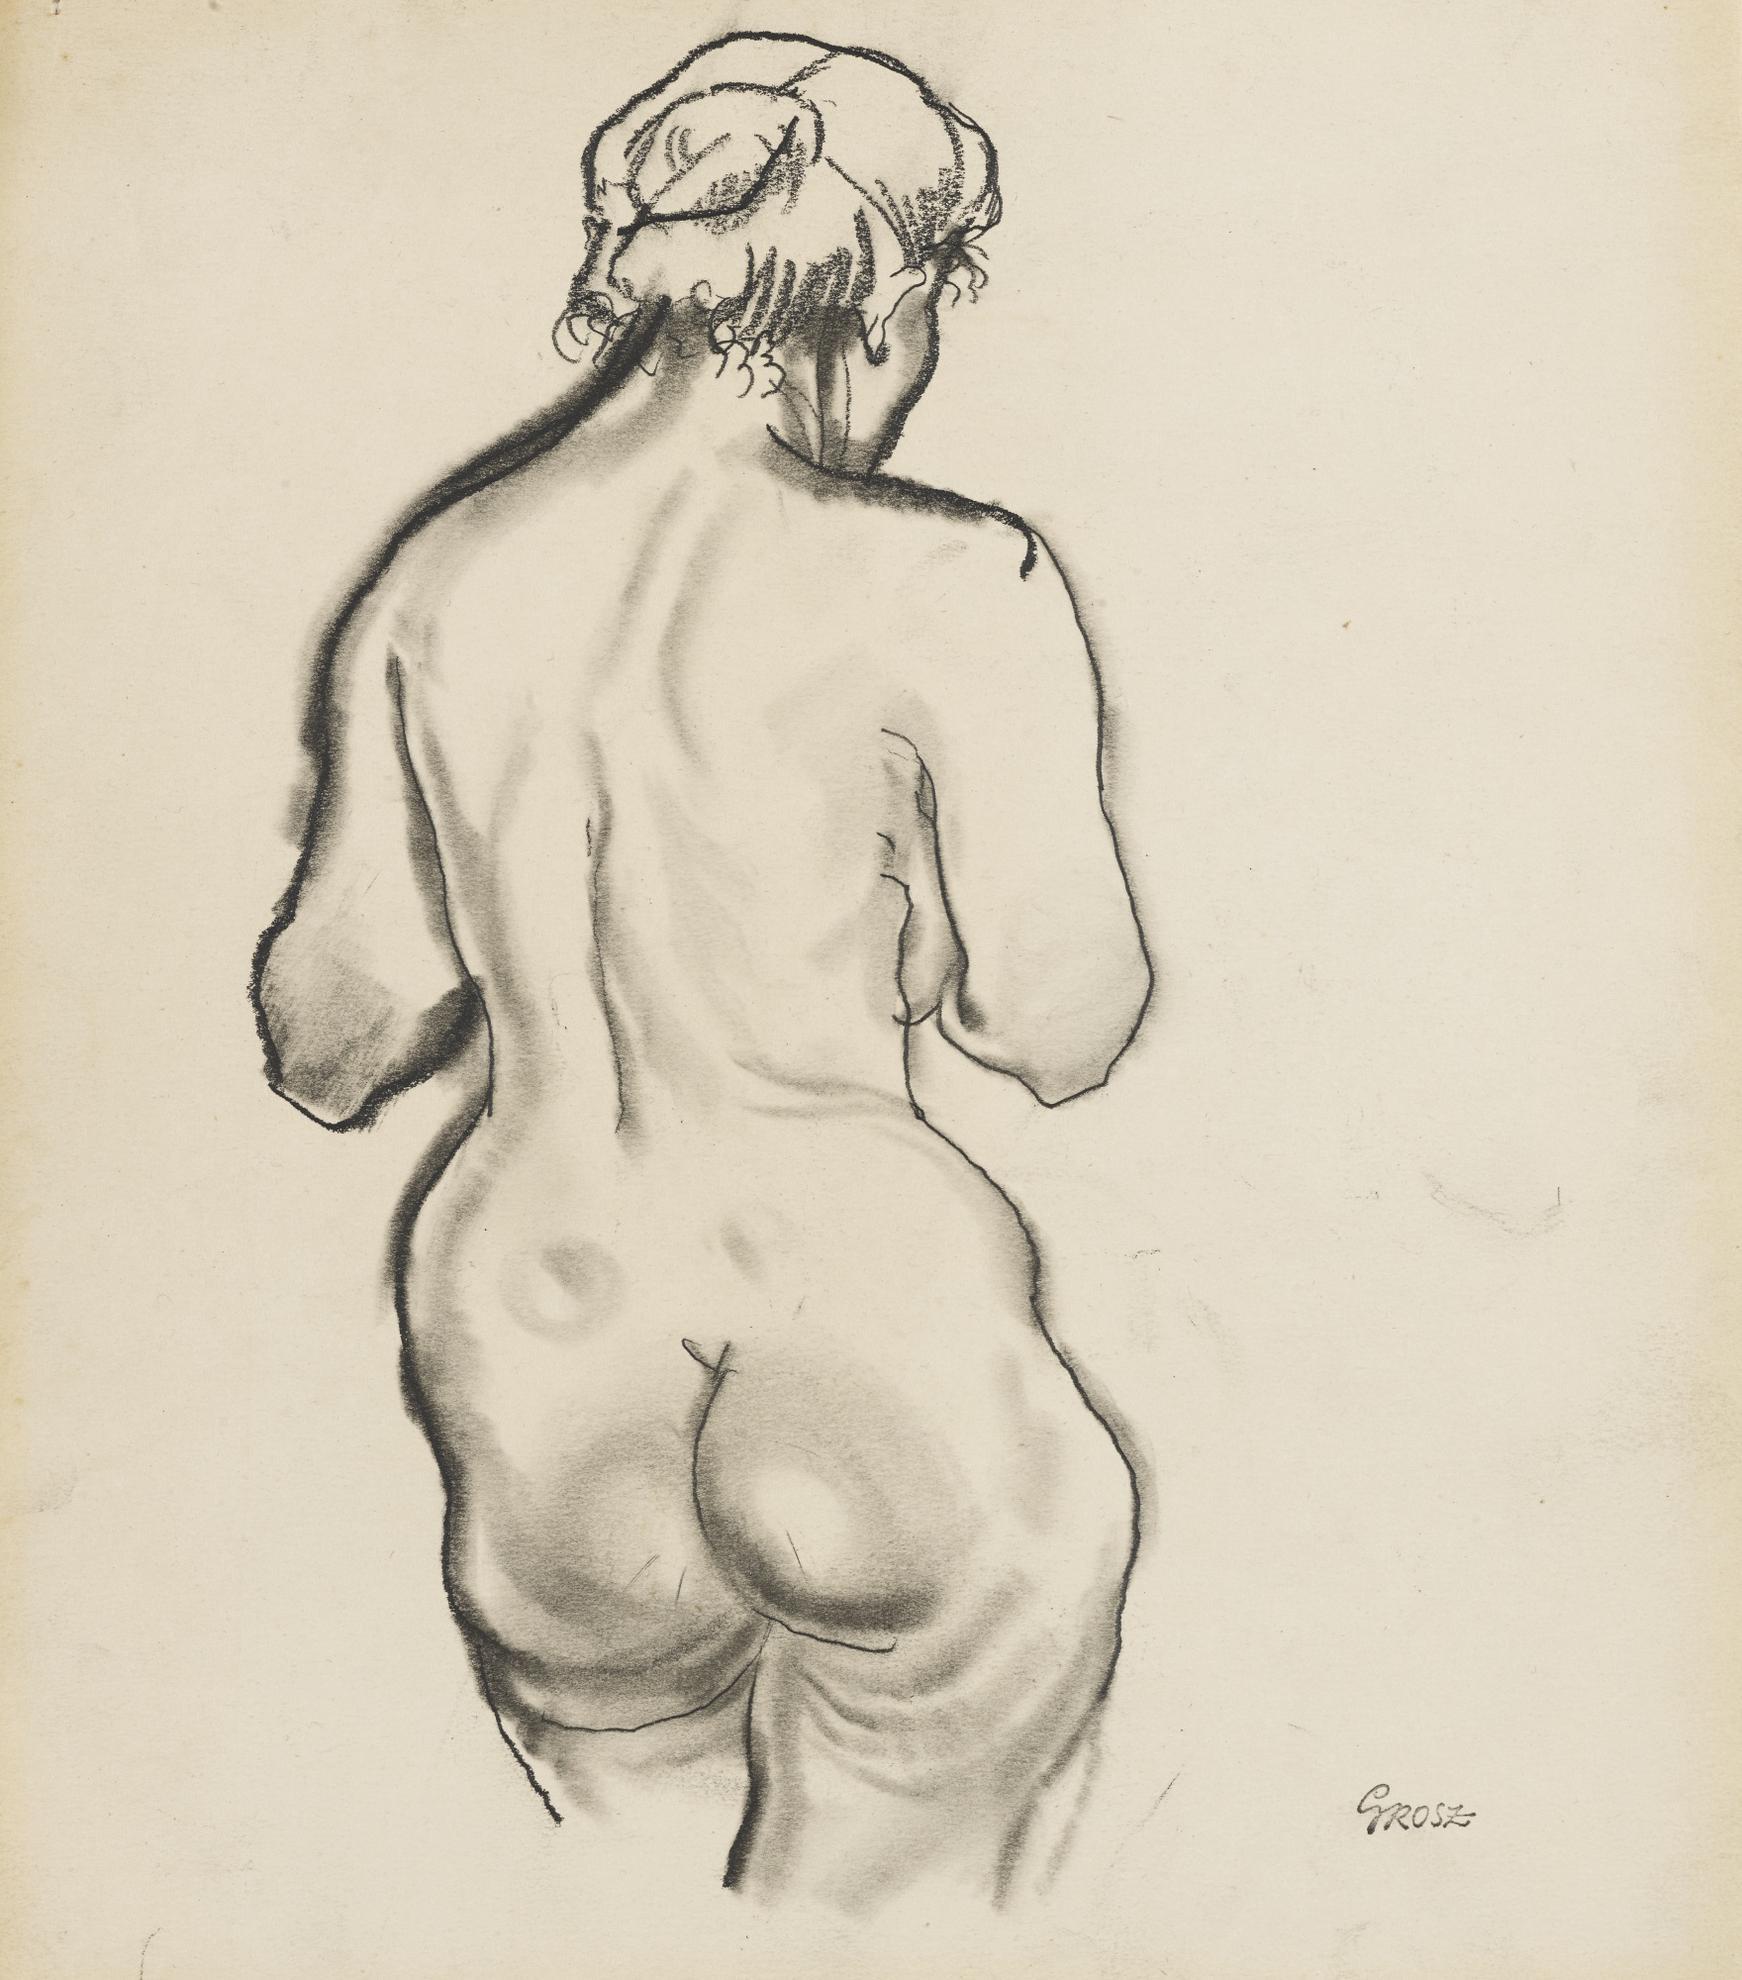 George Grosz-Weiblecher Ruckenakt (Female Nude Seen From Behind)-1915